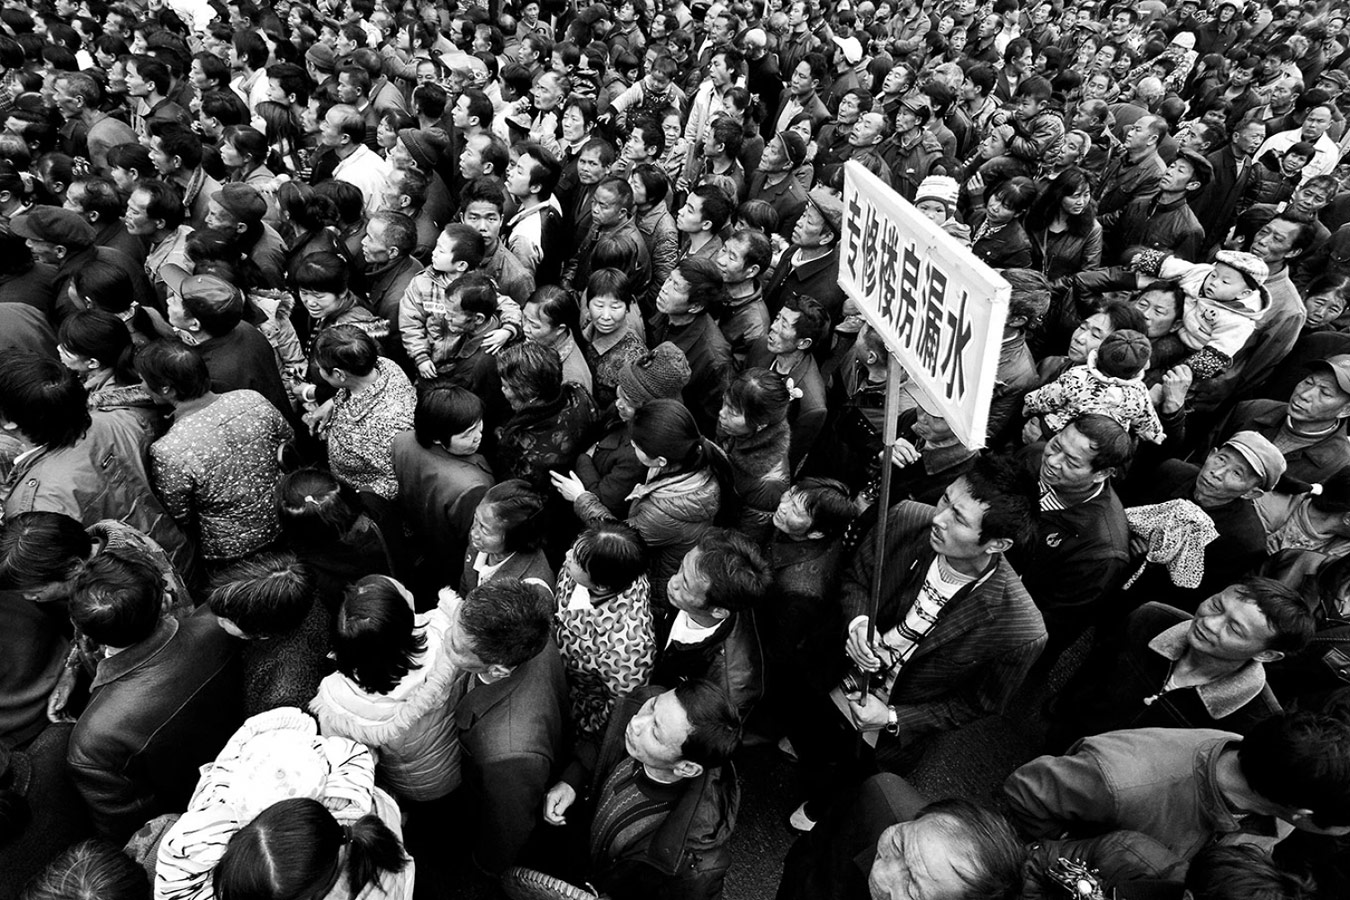 Объявление, © Цян ЧЭН, 1-е место в категории «Фотожурналистика / Документалистика», непрофессионал, Фотоконкурс «Зебра» — Zebra — Чёрно-белый фотограф года